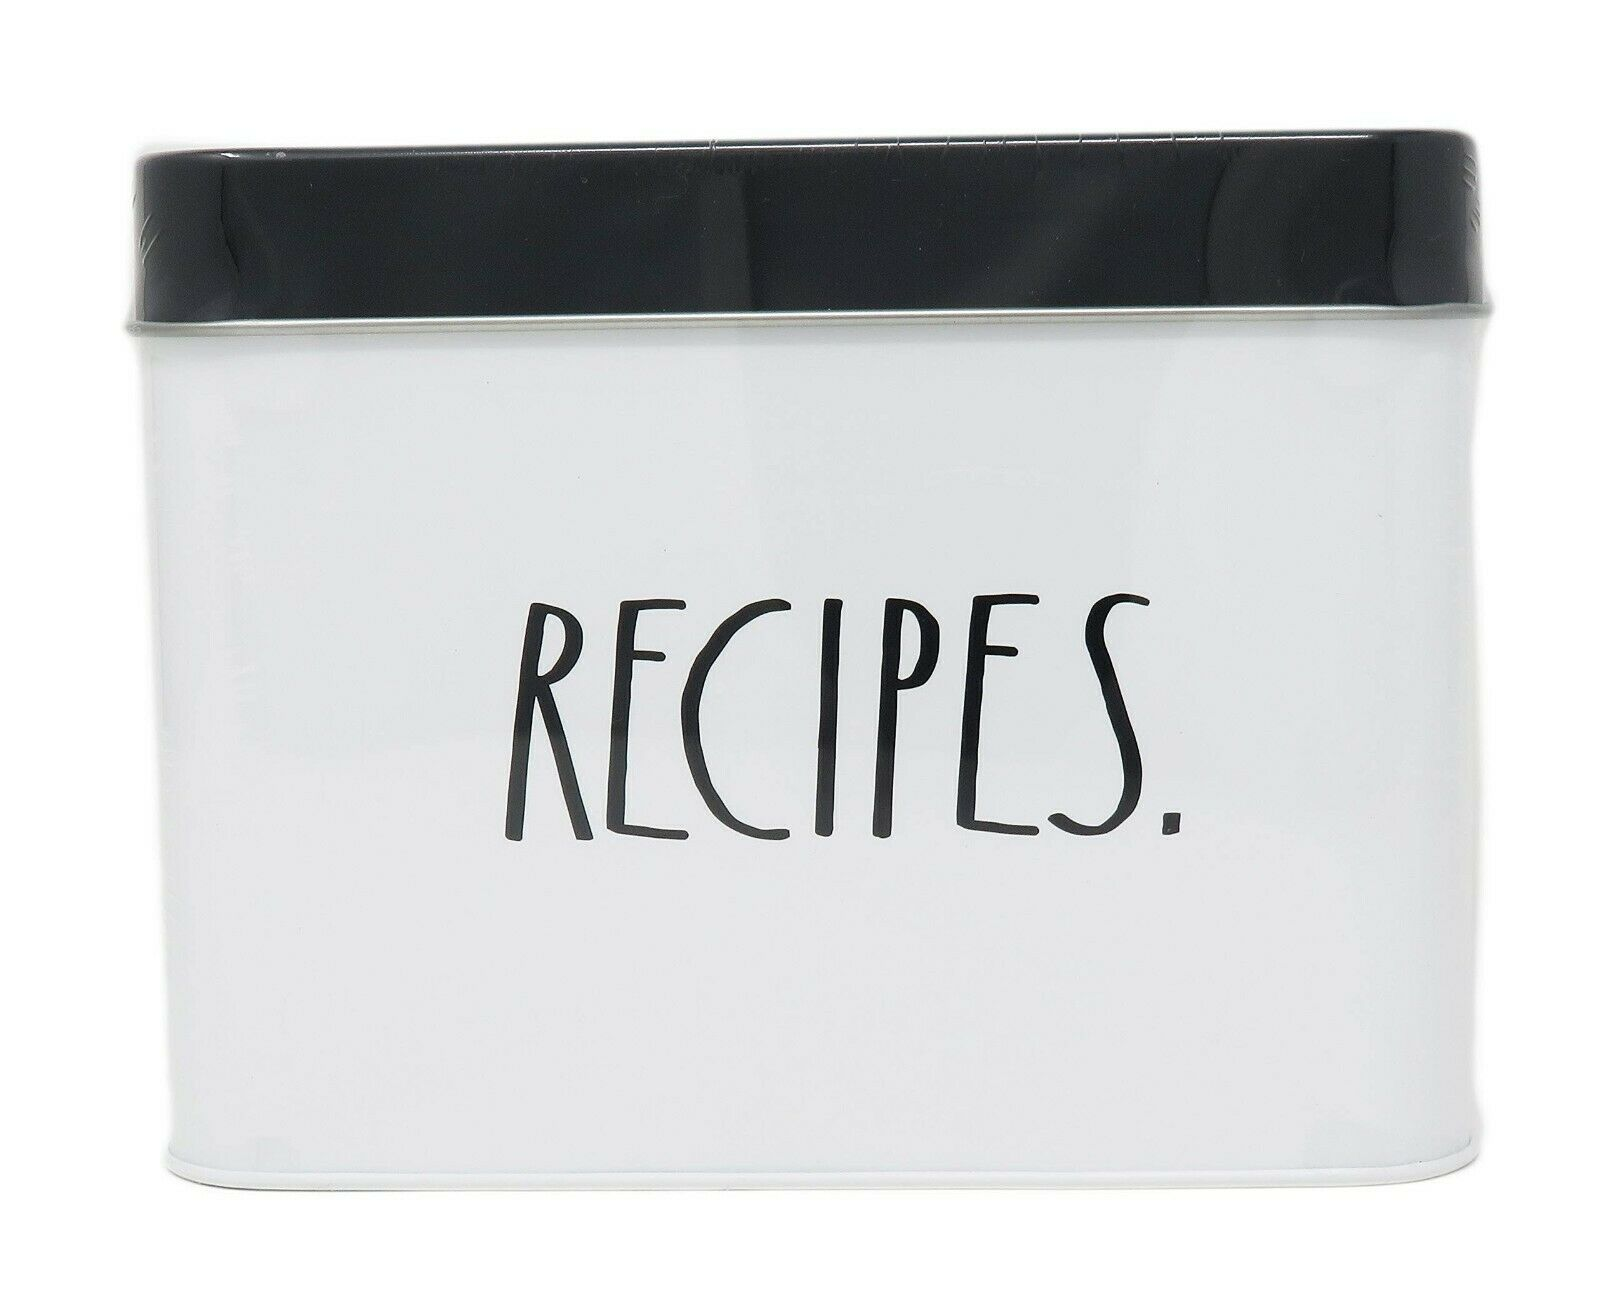 RECIPE DIVIDERS recipe inserts 4x6 recipe dividers wood dividers- recipe box cards custom recipe dividers BLACK Rae Dunn style